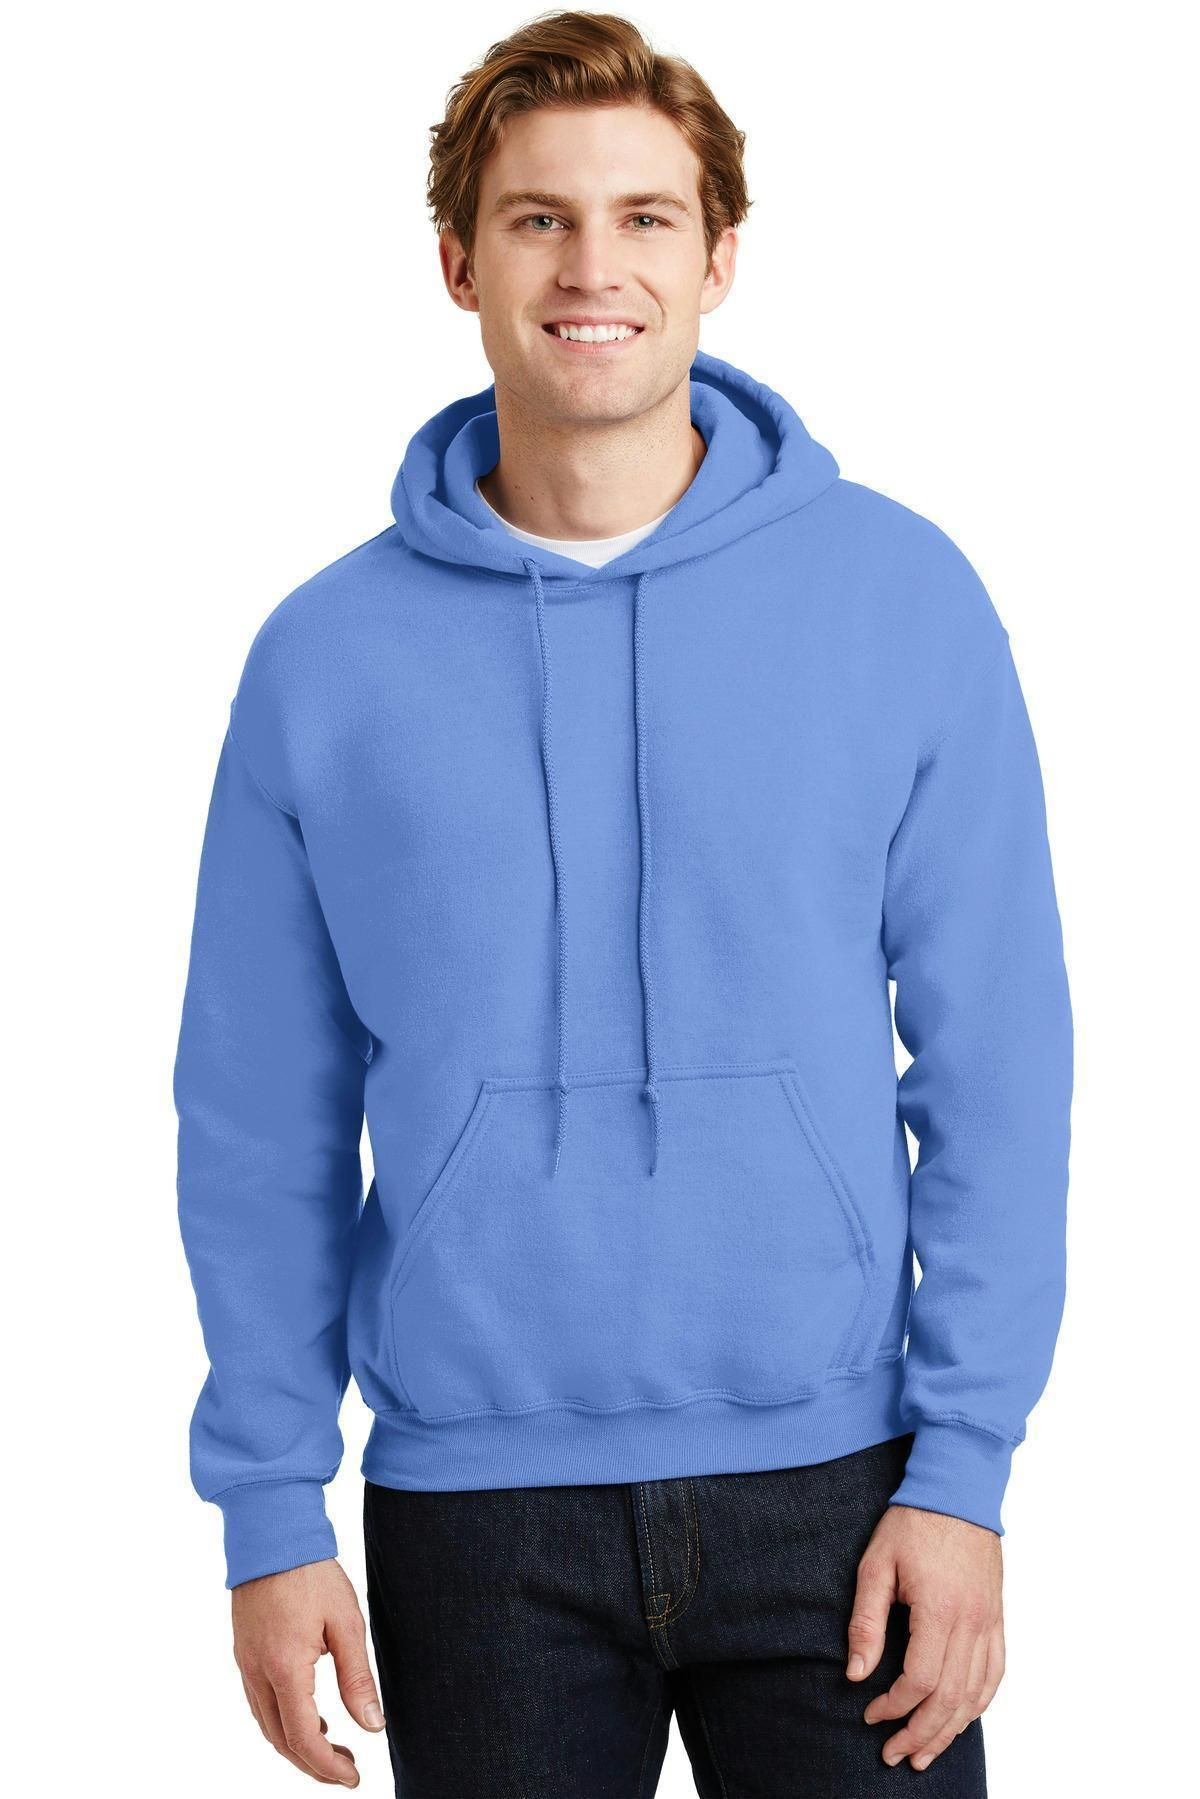 HANES CLOSEOUT-BOY/'S  BLUE//BLACK//GRAY PREMIUM-CREW-SOFT SWEAT-SHIRT-WARM-COMFY